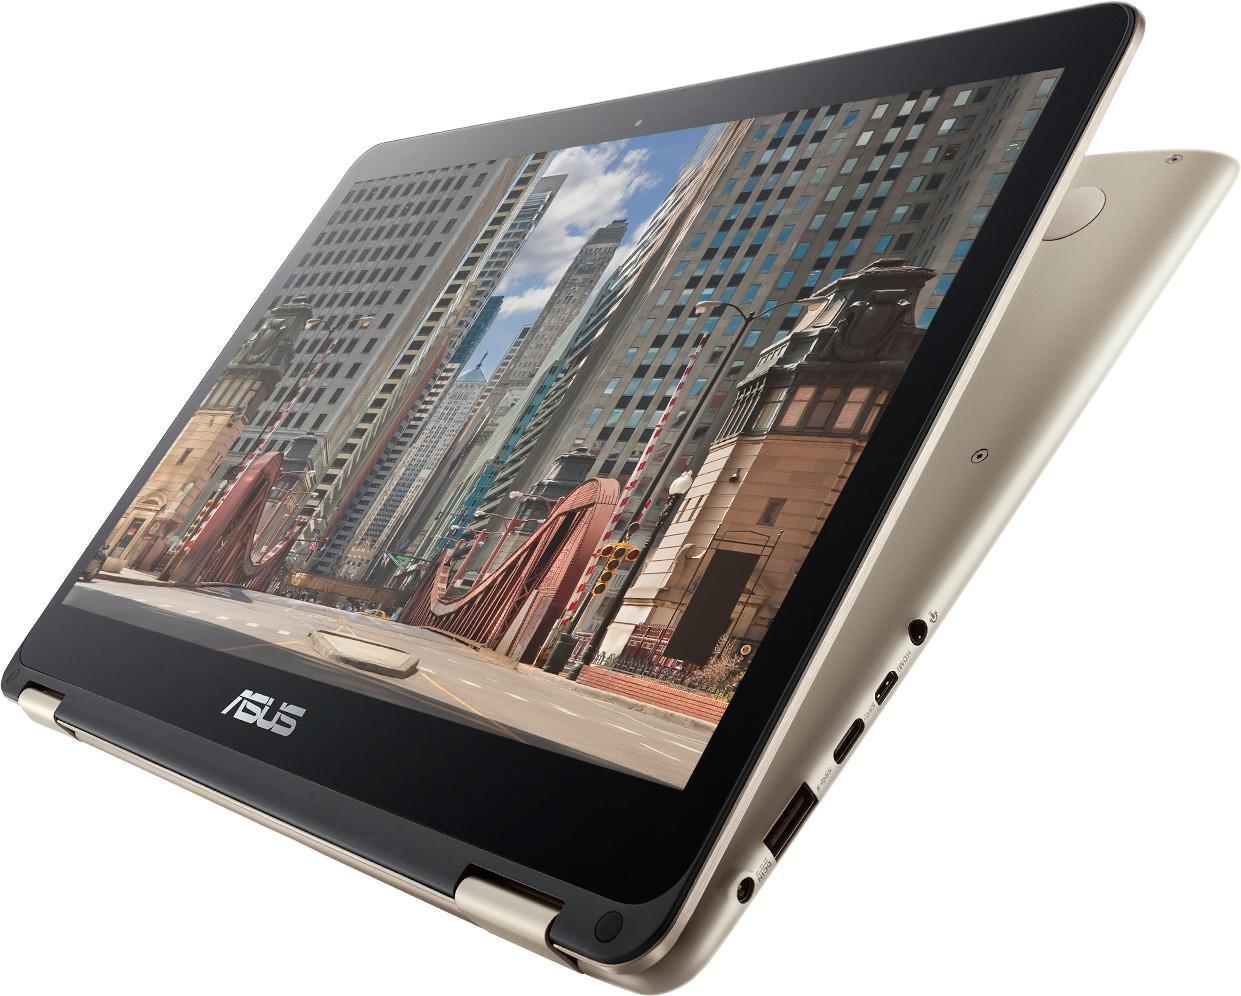 Asus ZenBook Flip (UX360CA-C4150T)